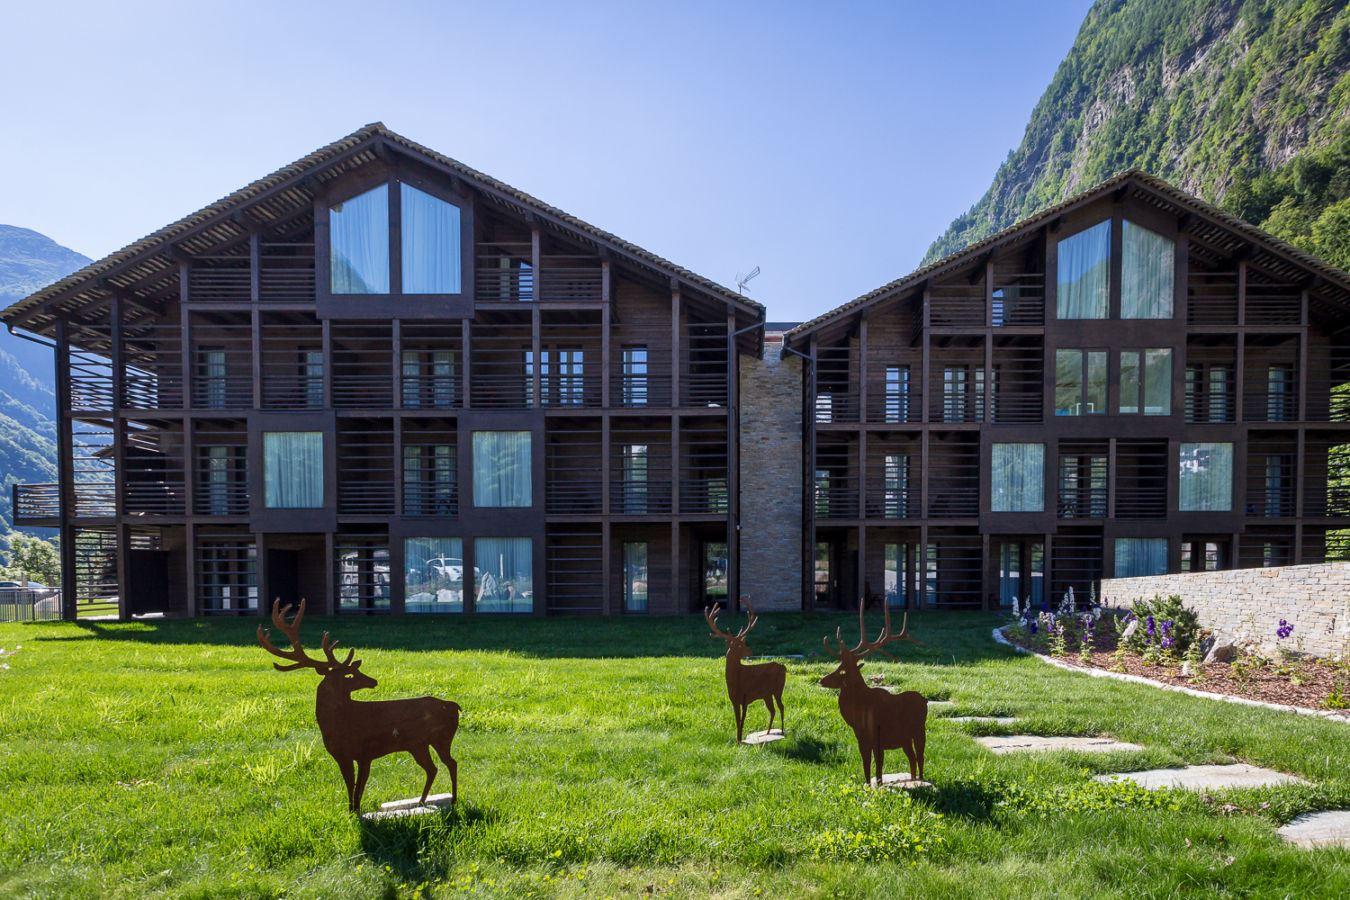 Mirtillo Rosso Family Hotel in Riva Valdobbia, Italy by Rita Cattaneo & Francesca Battisti